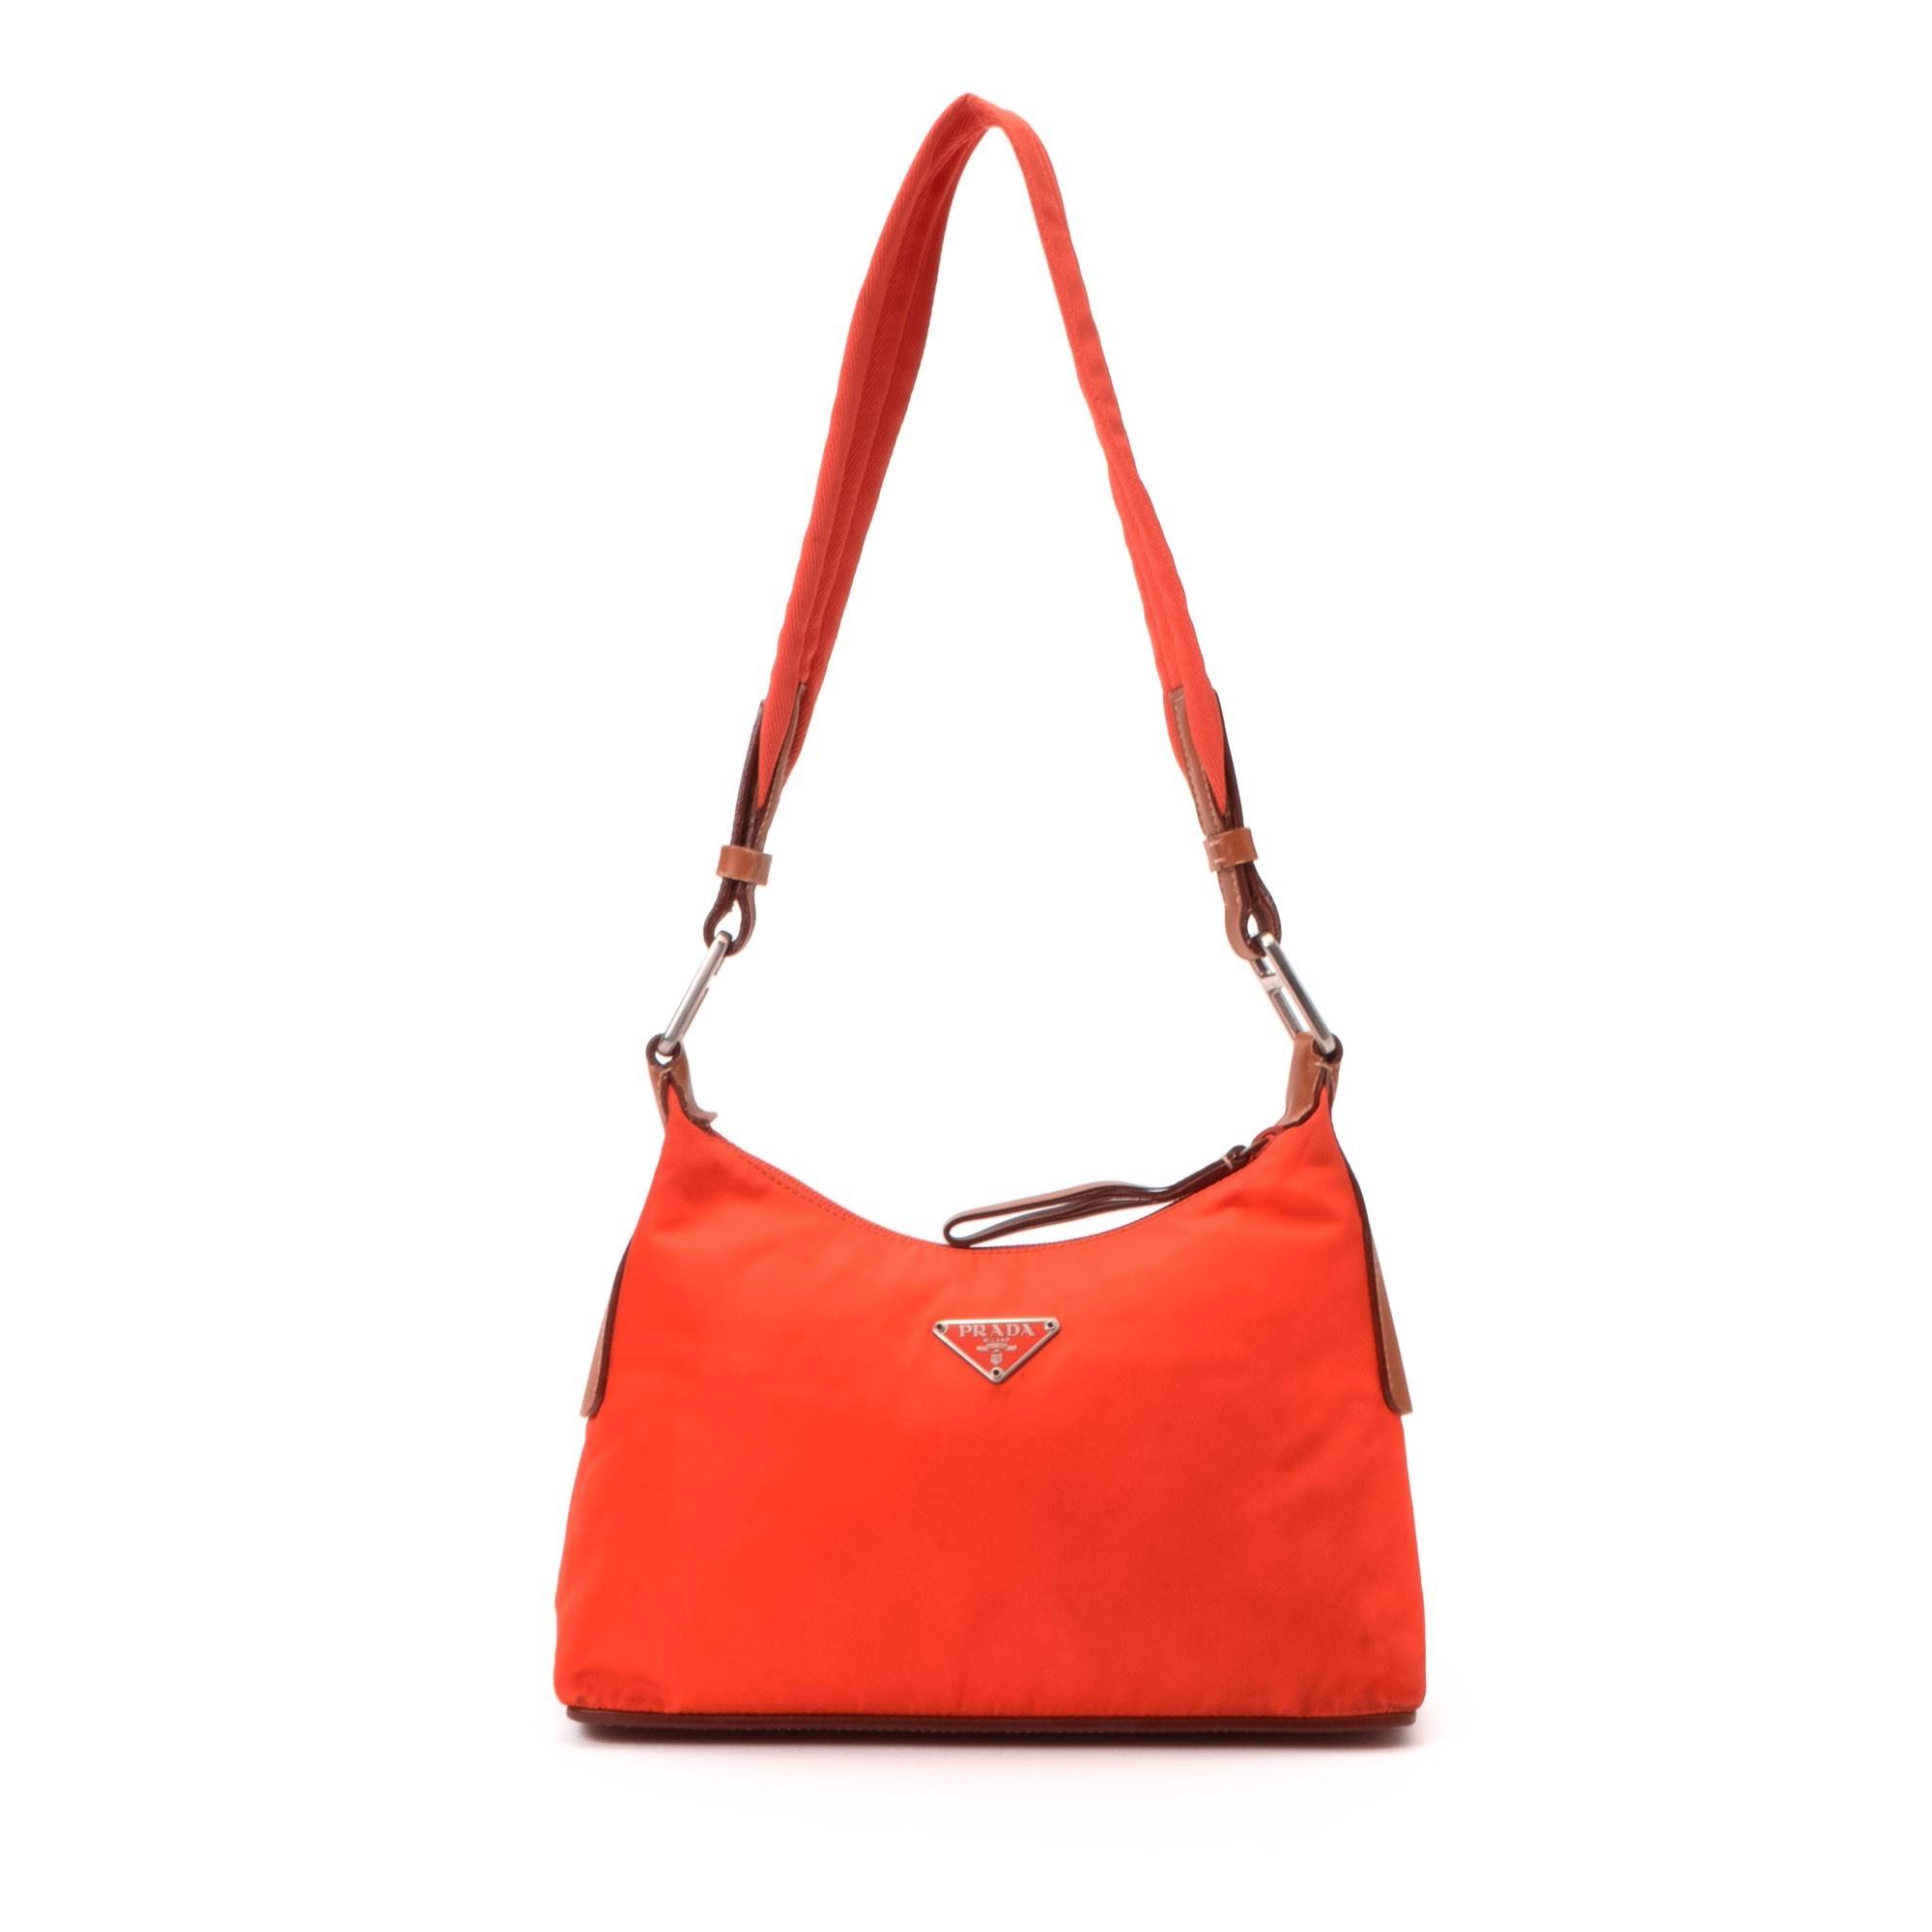 prada nylon shopping tote - Prada Tessuto Shoulder Bag Orange Nylon Shoulder Bag - LXR\u0026amp;CO ...